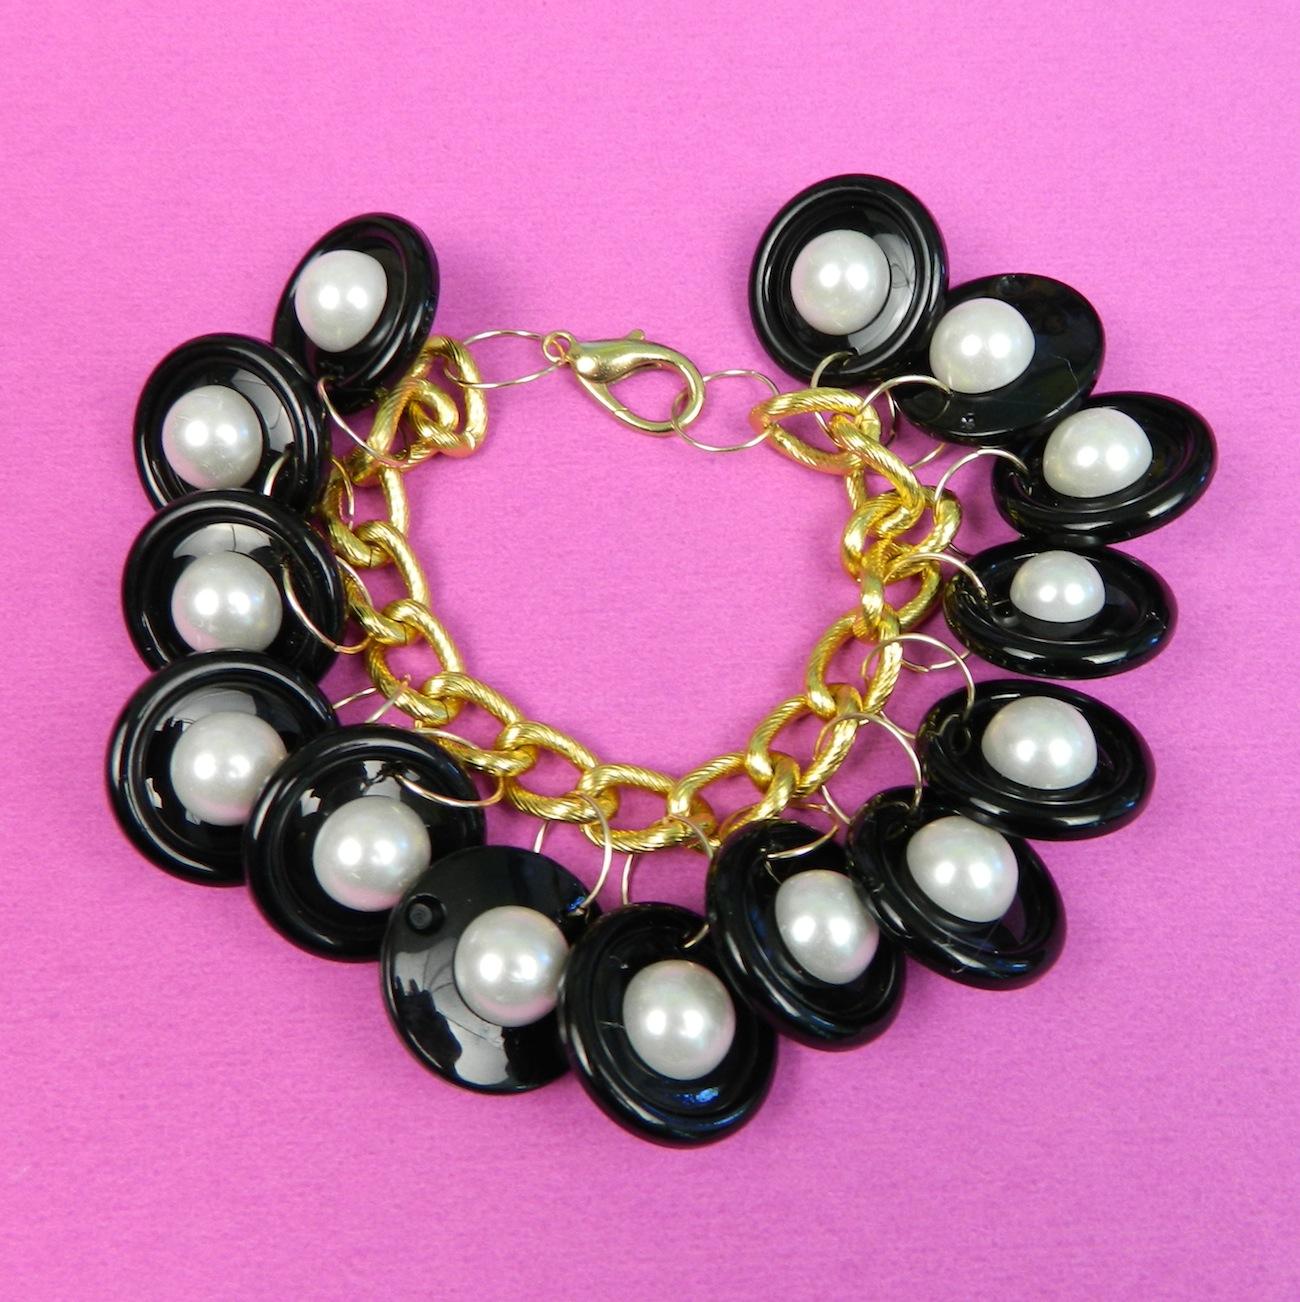 0632a0547f Chanel Inspired Charm Bracelet DIY